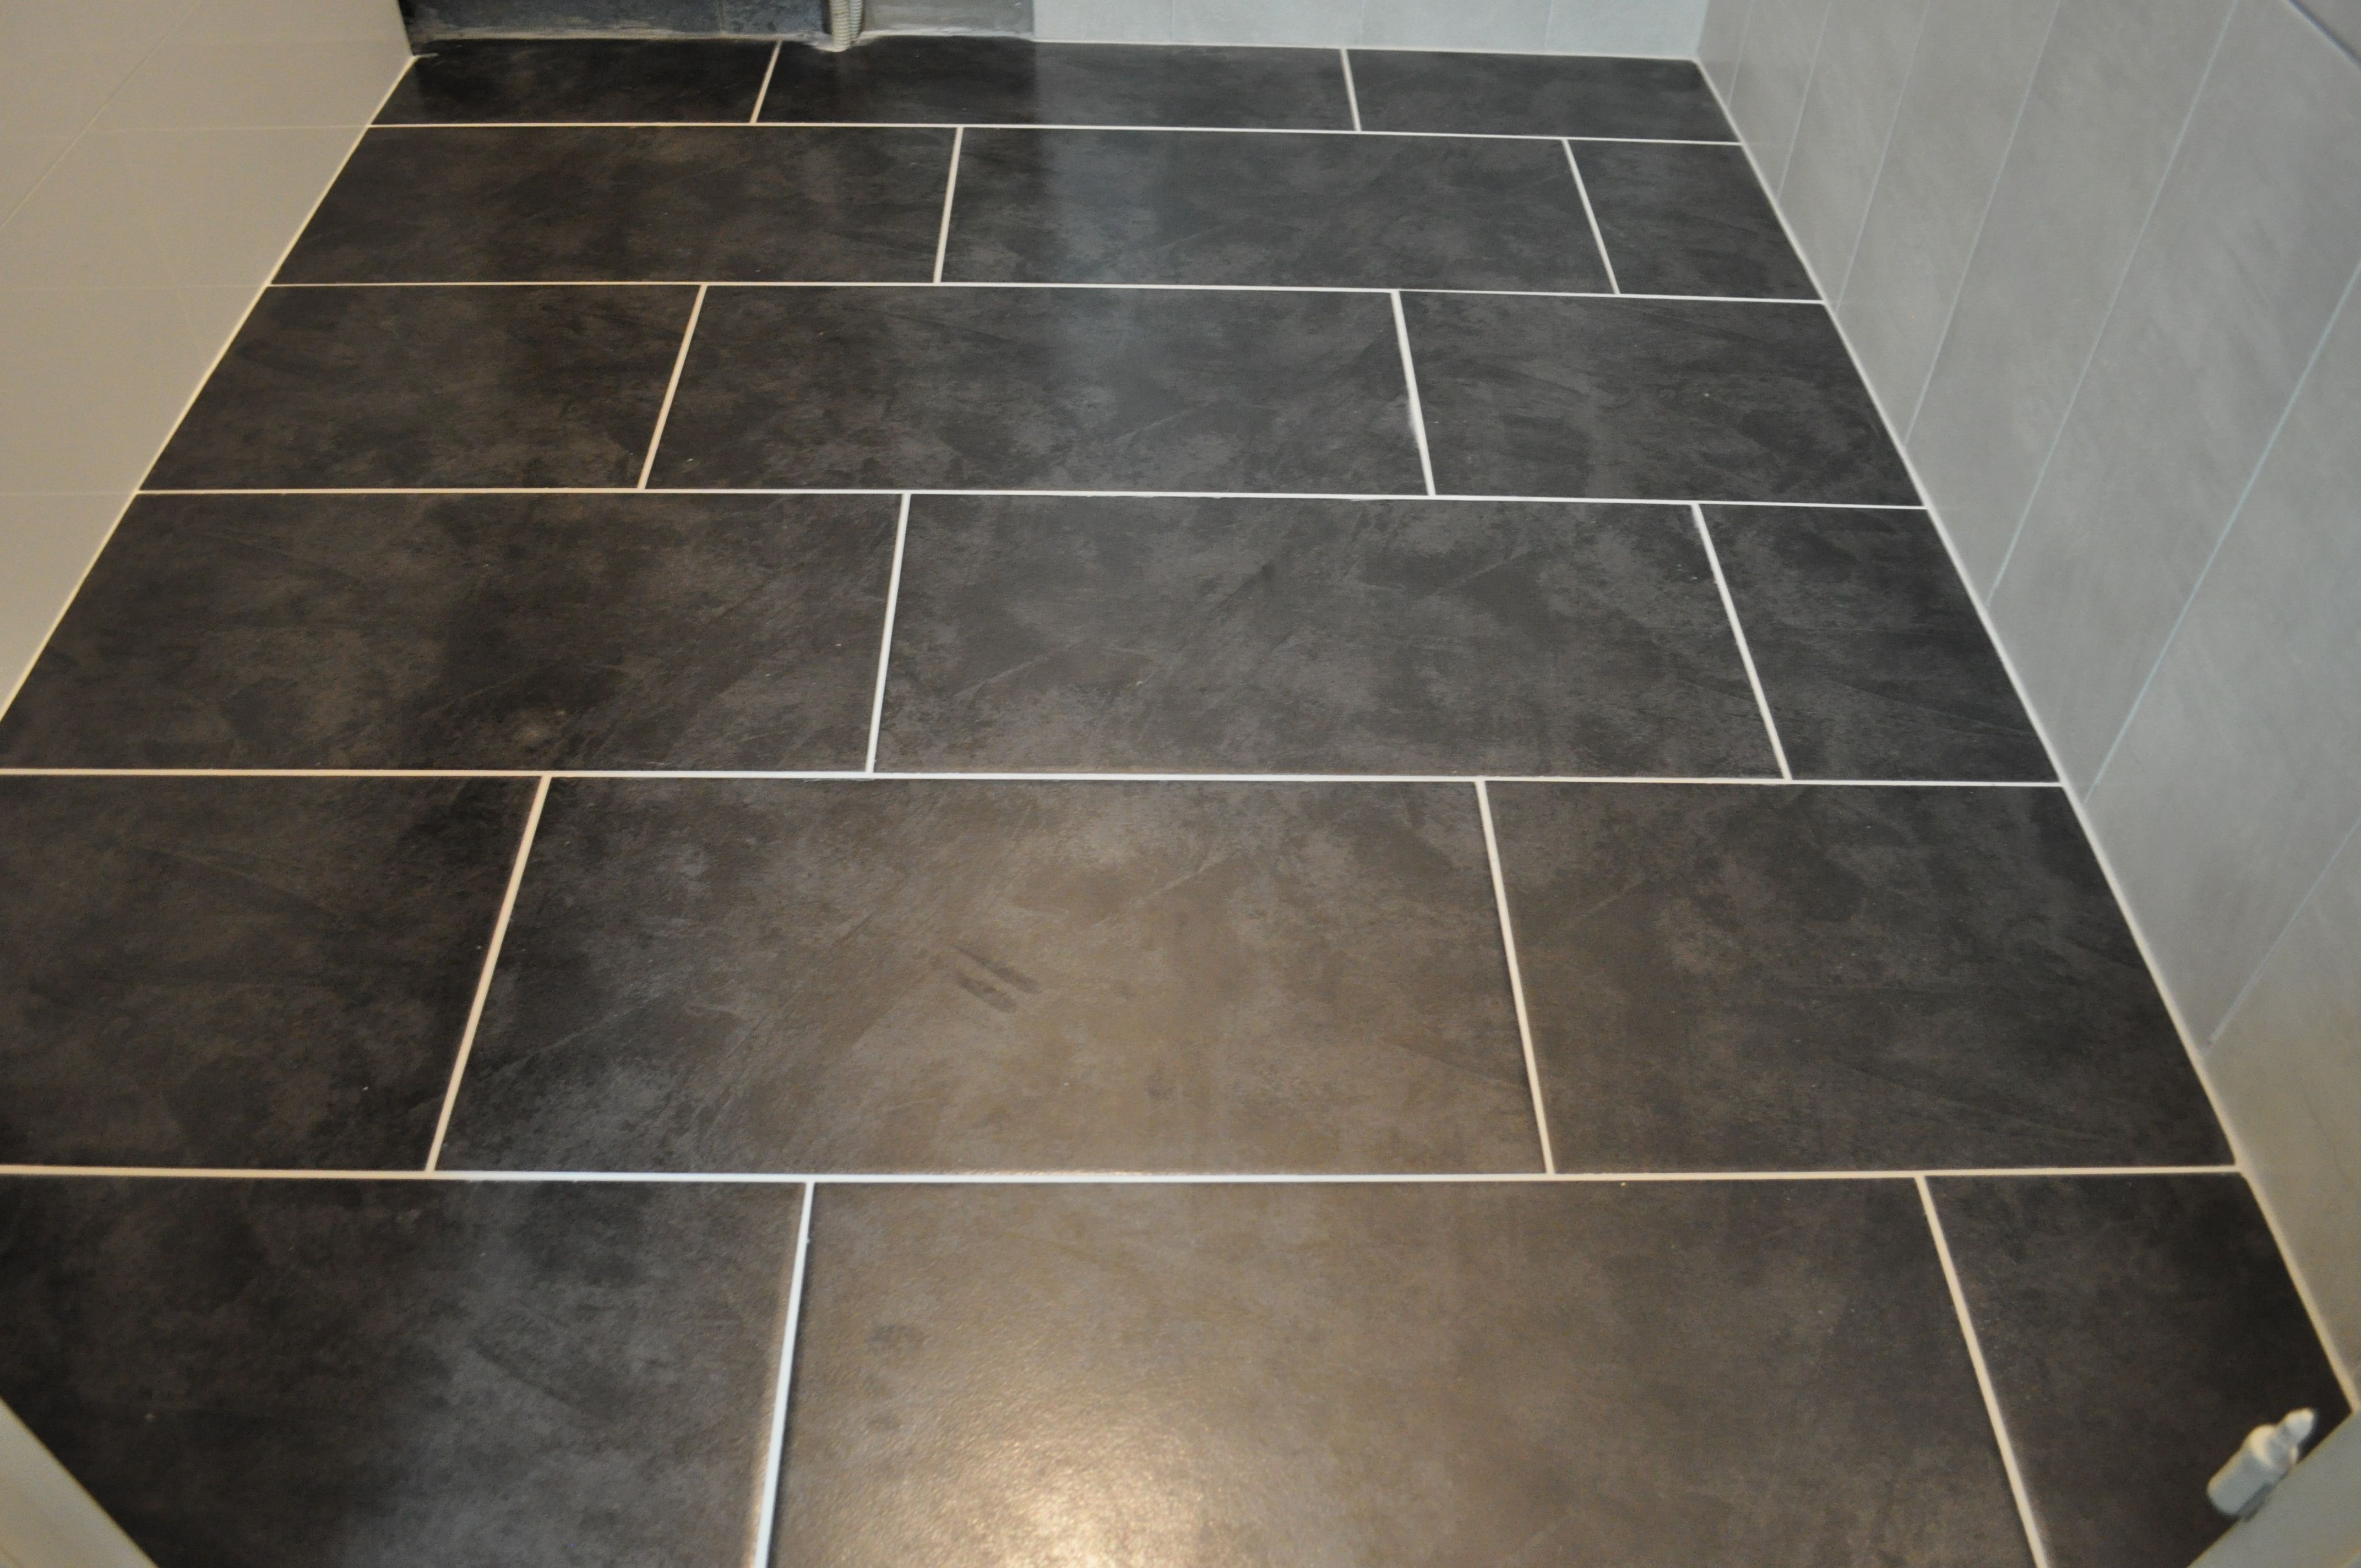 Rectangular Floor Tiles In Brick Pattern Brick Patterns